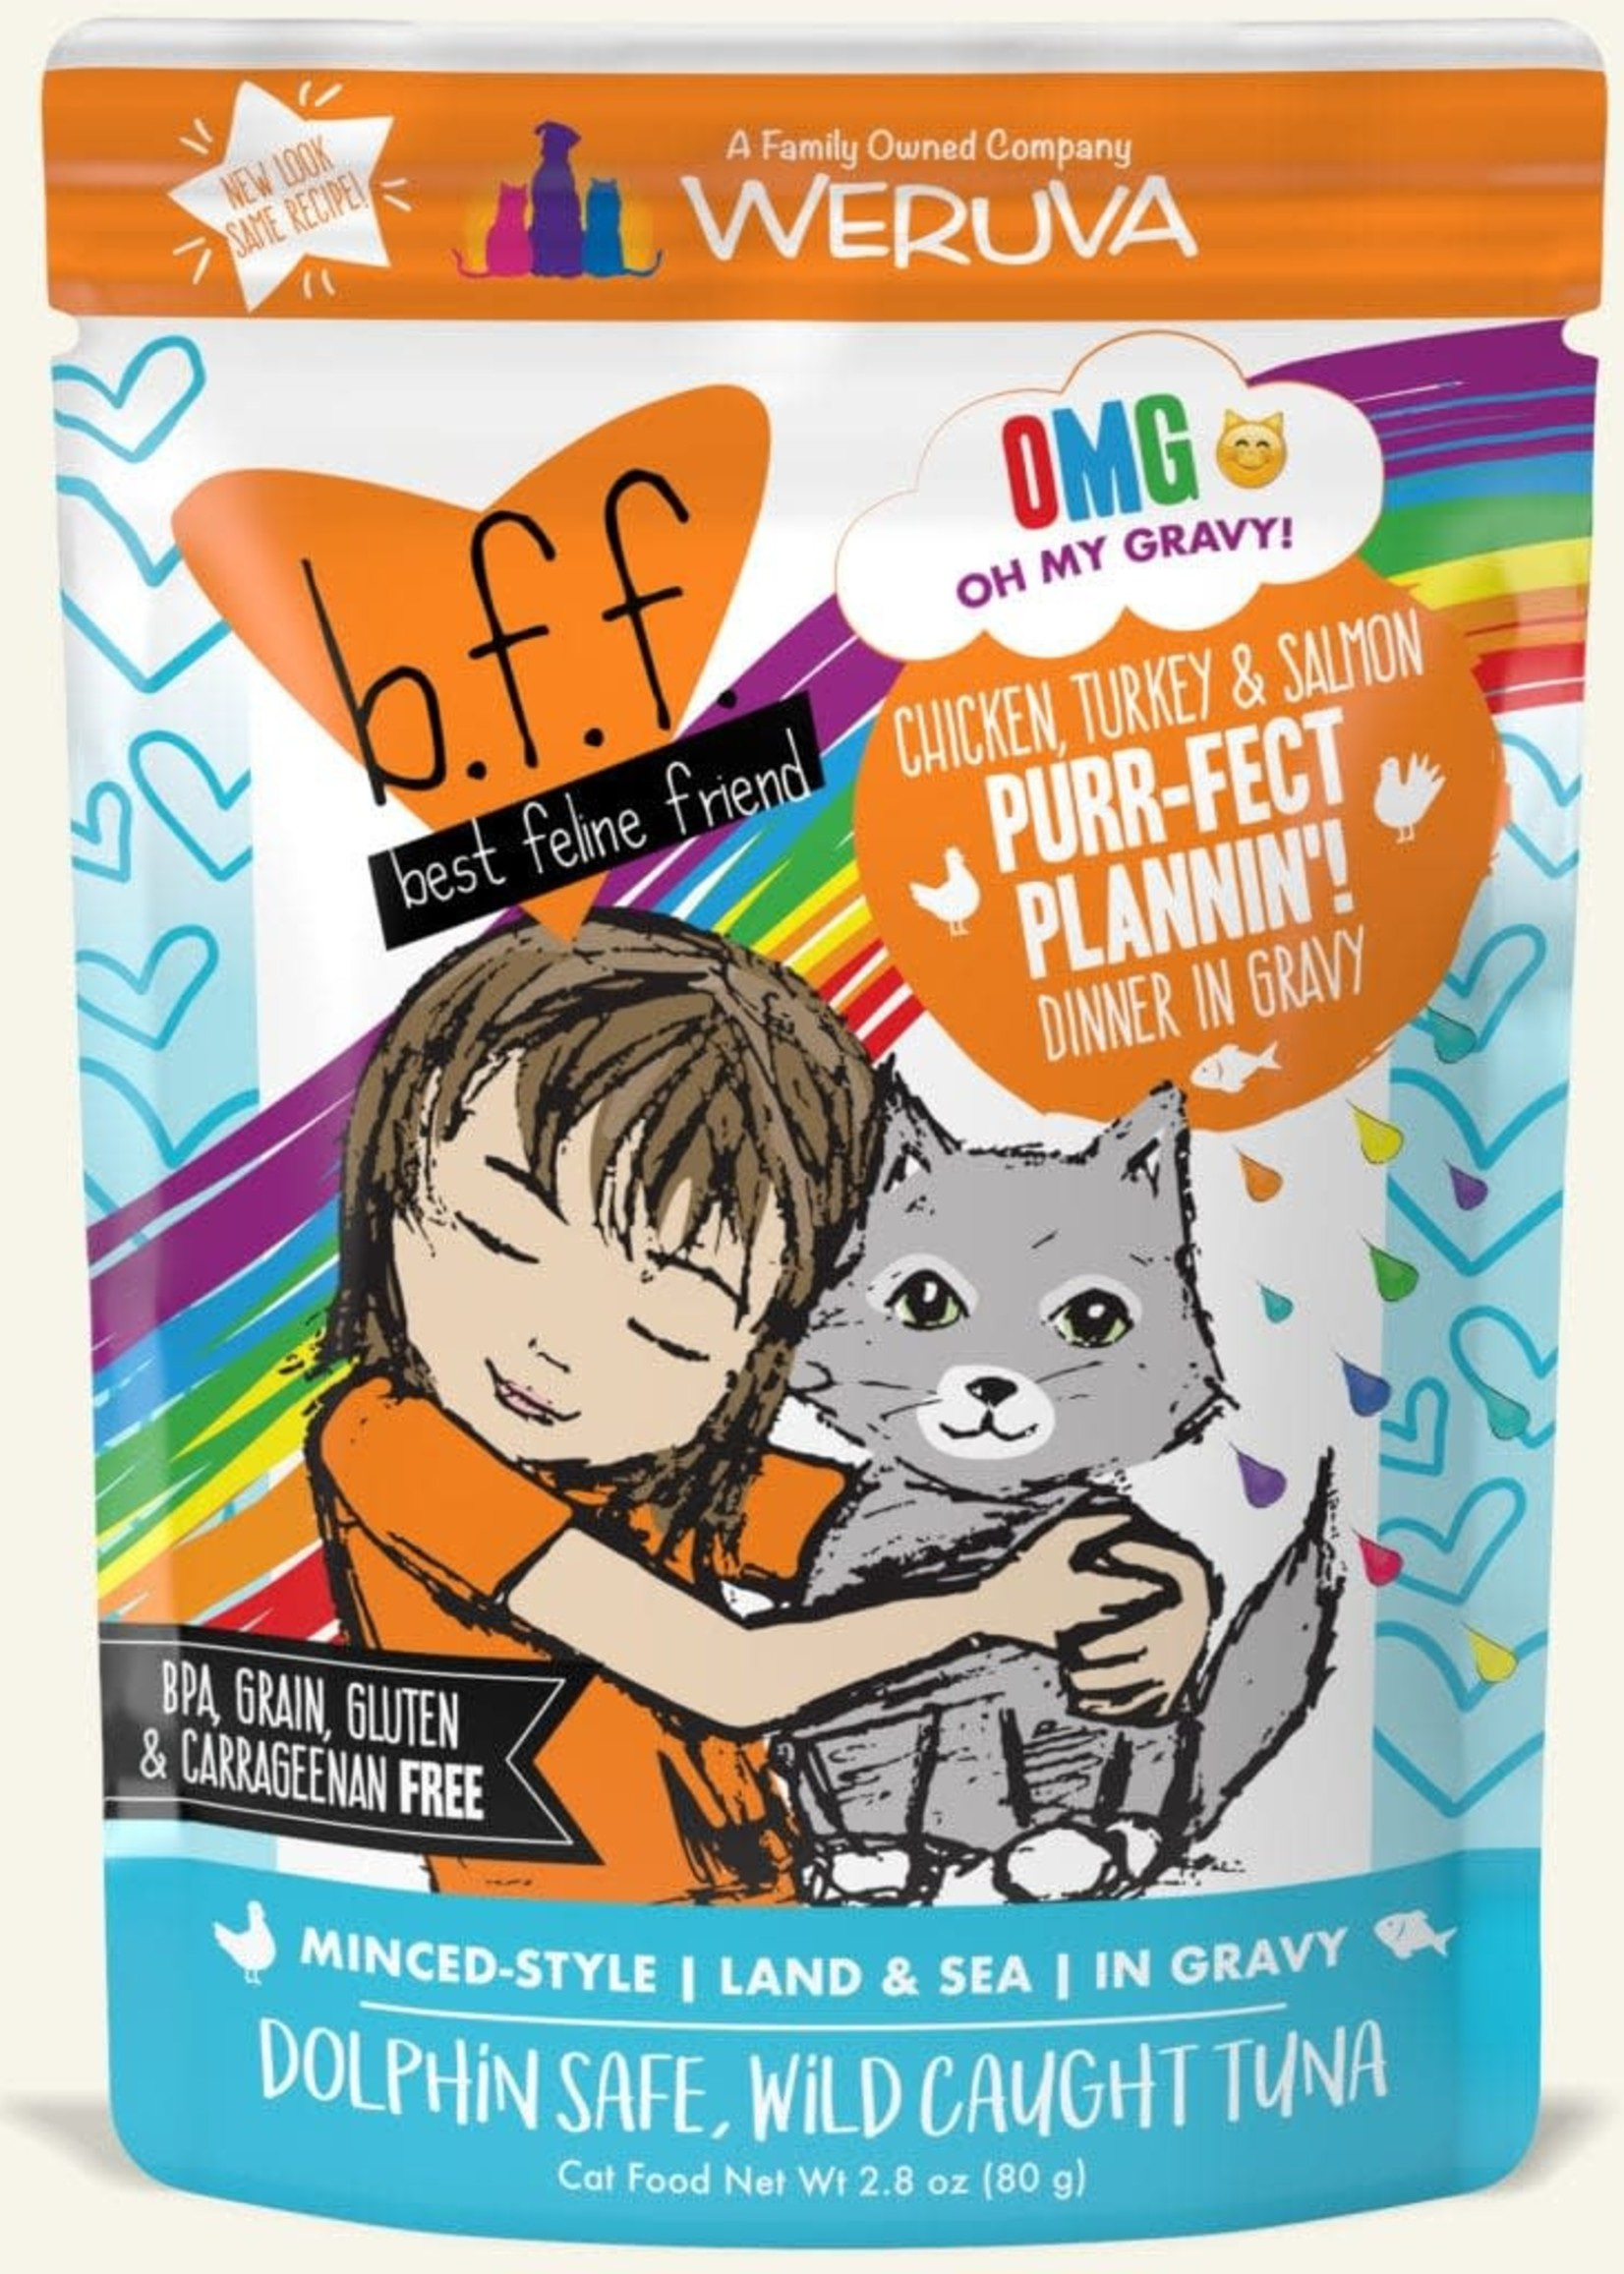 Weruva B.F.F. OMG Purr-Fect Plannin'! Wet Cat Food 2.8oz Case